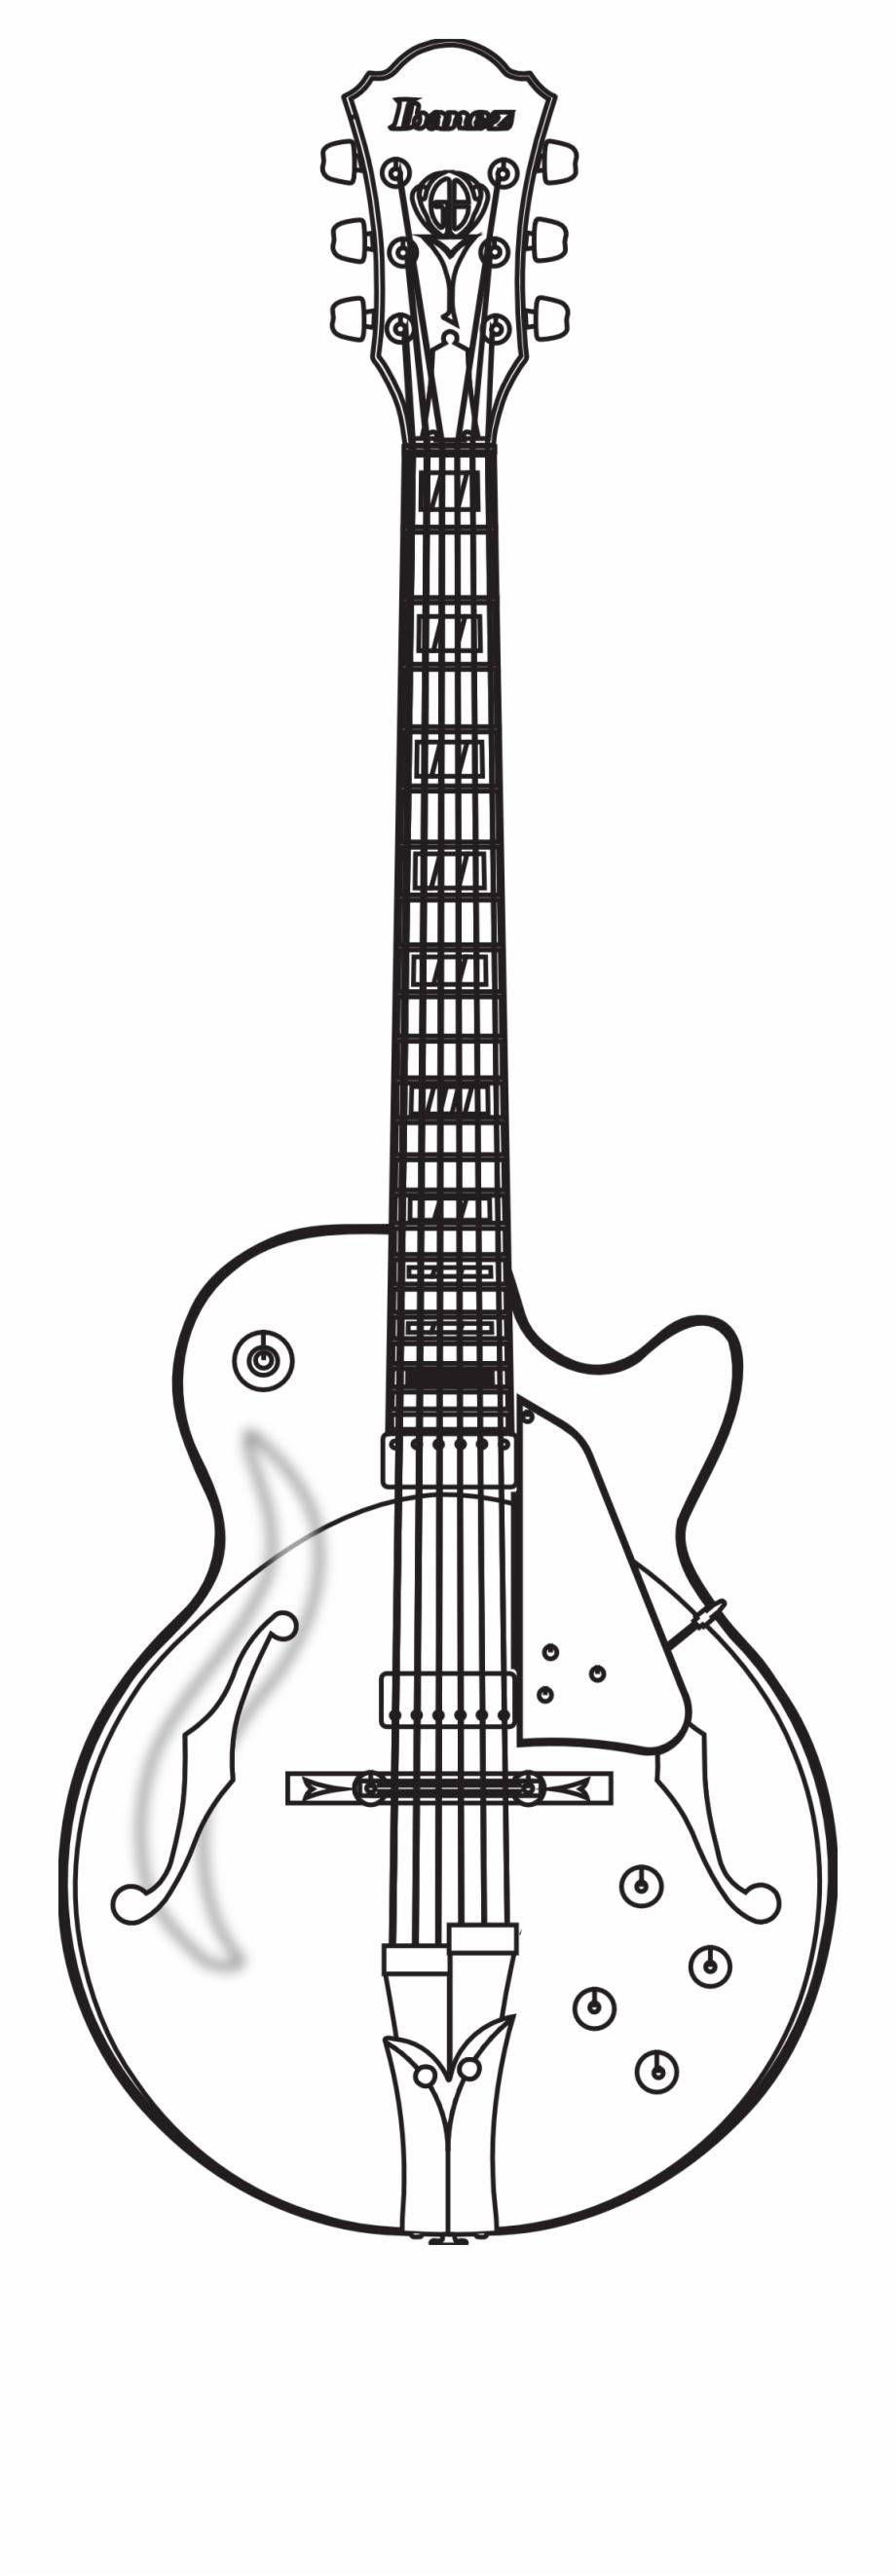 Ibanez Gb Brut Guitar Black White Art Svg Colouringbook.